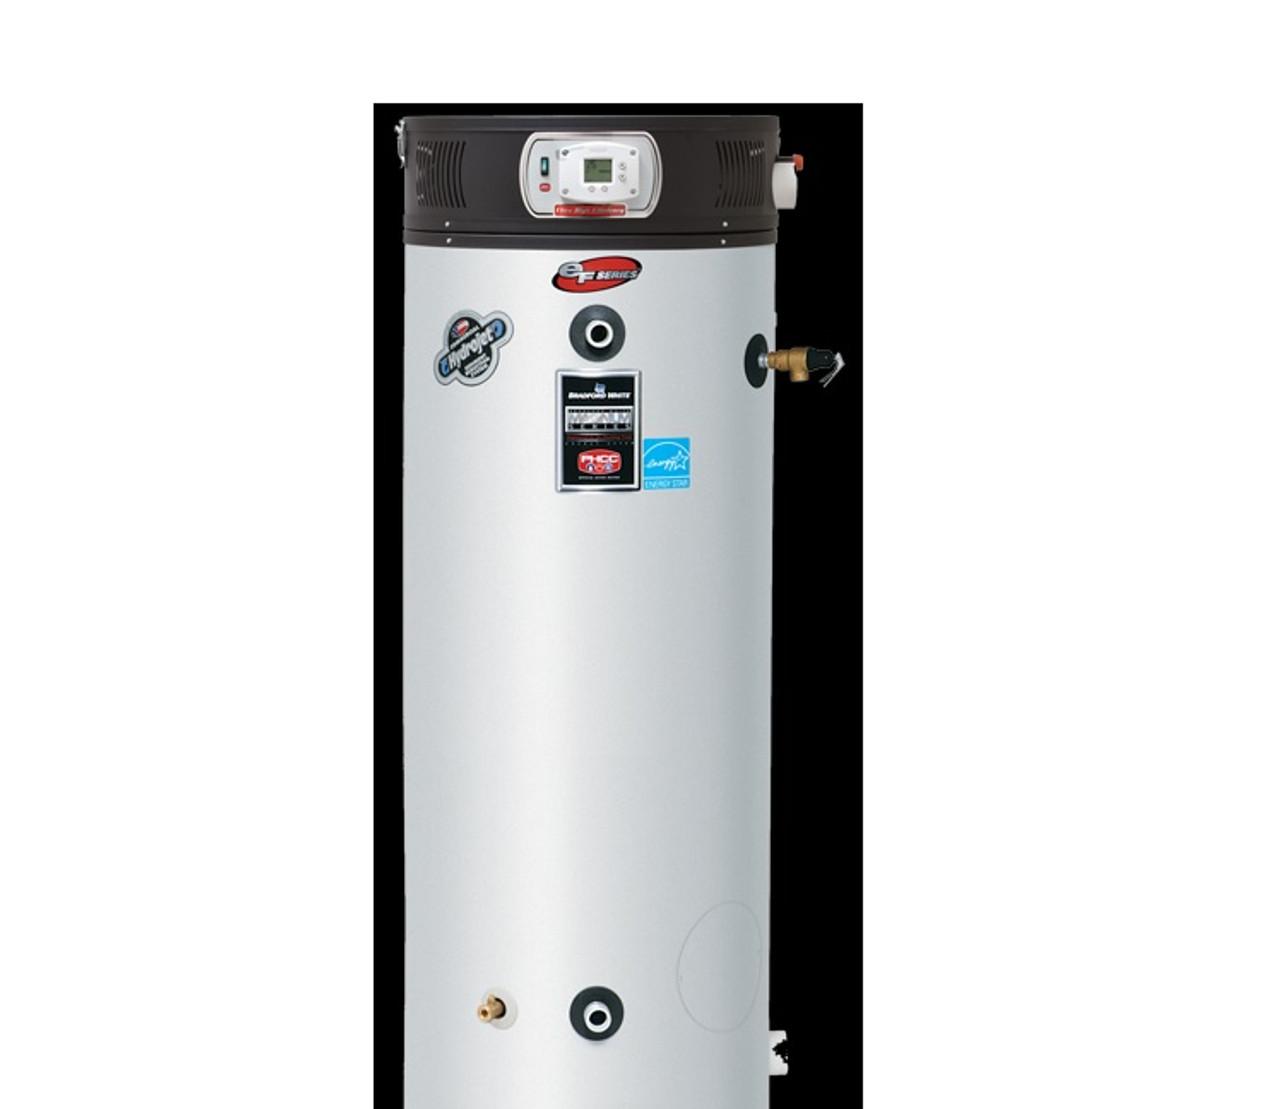 Bradford Water Heater >> Bradford White Ef100t 150 E3n Ef Series 100 Gal 150 000 Btu Natural Gas Commercial Water Heater